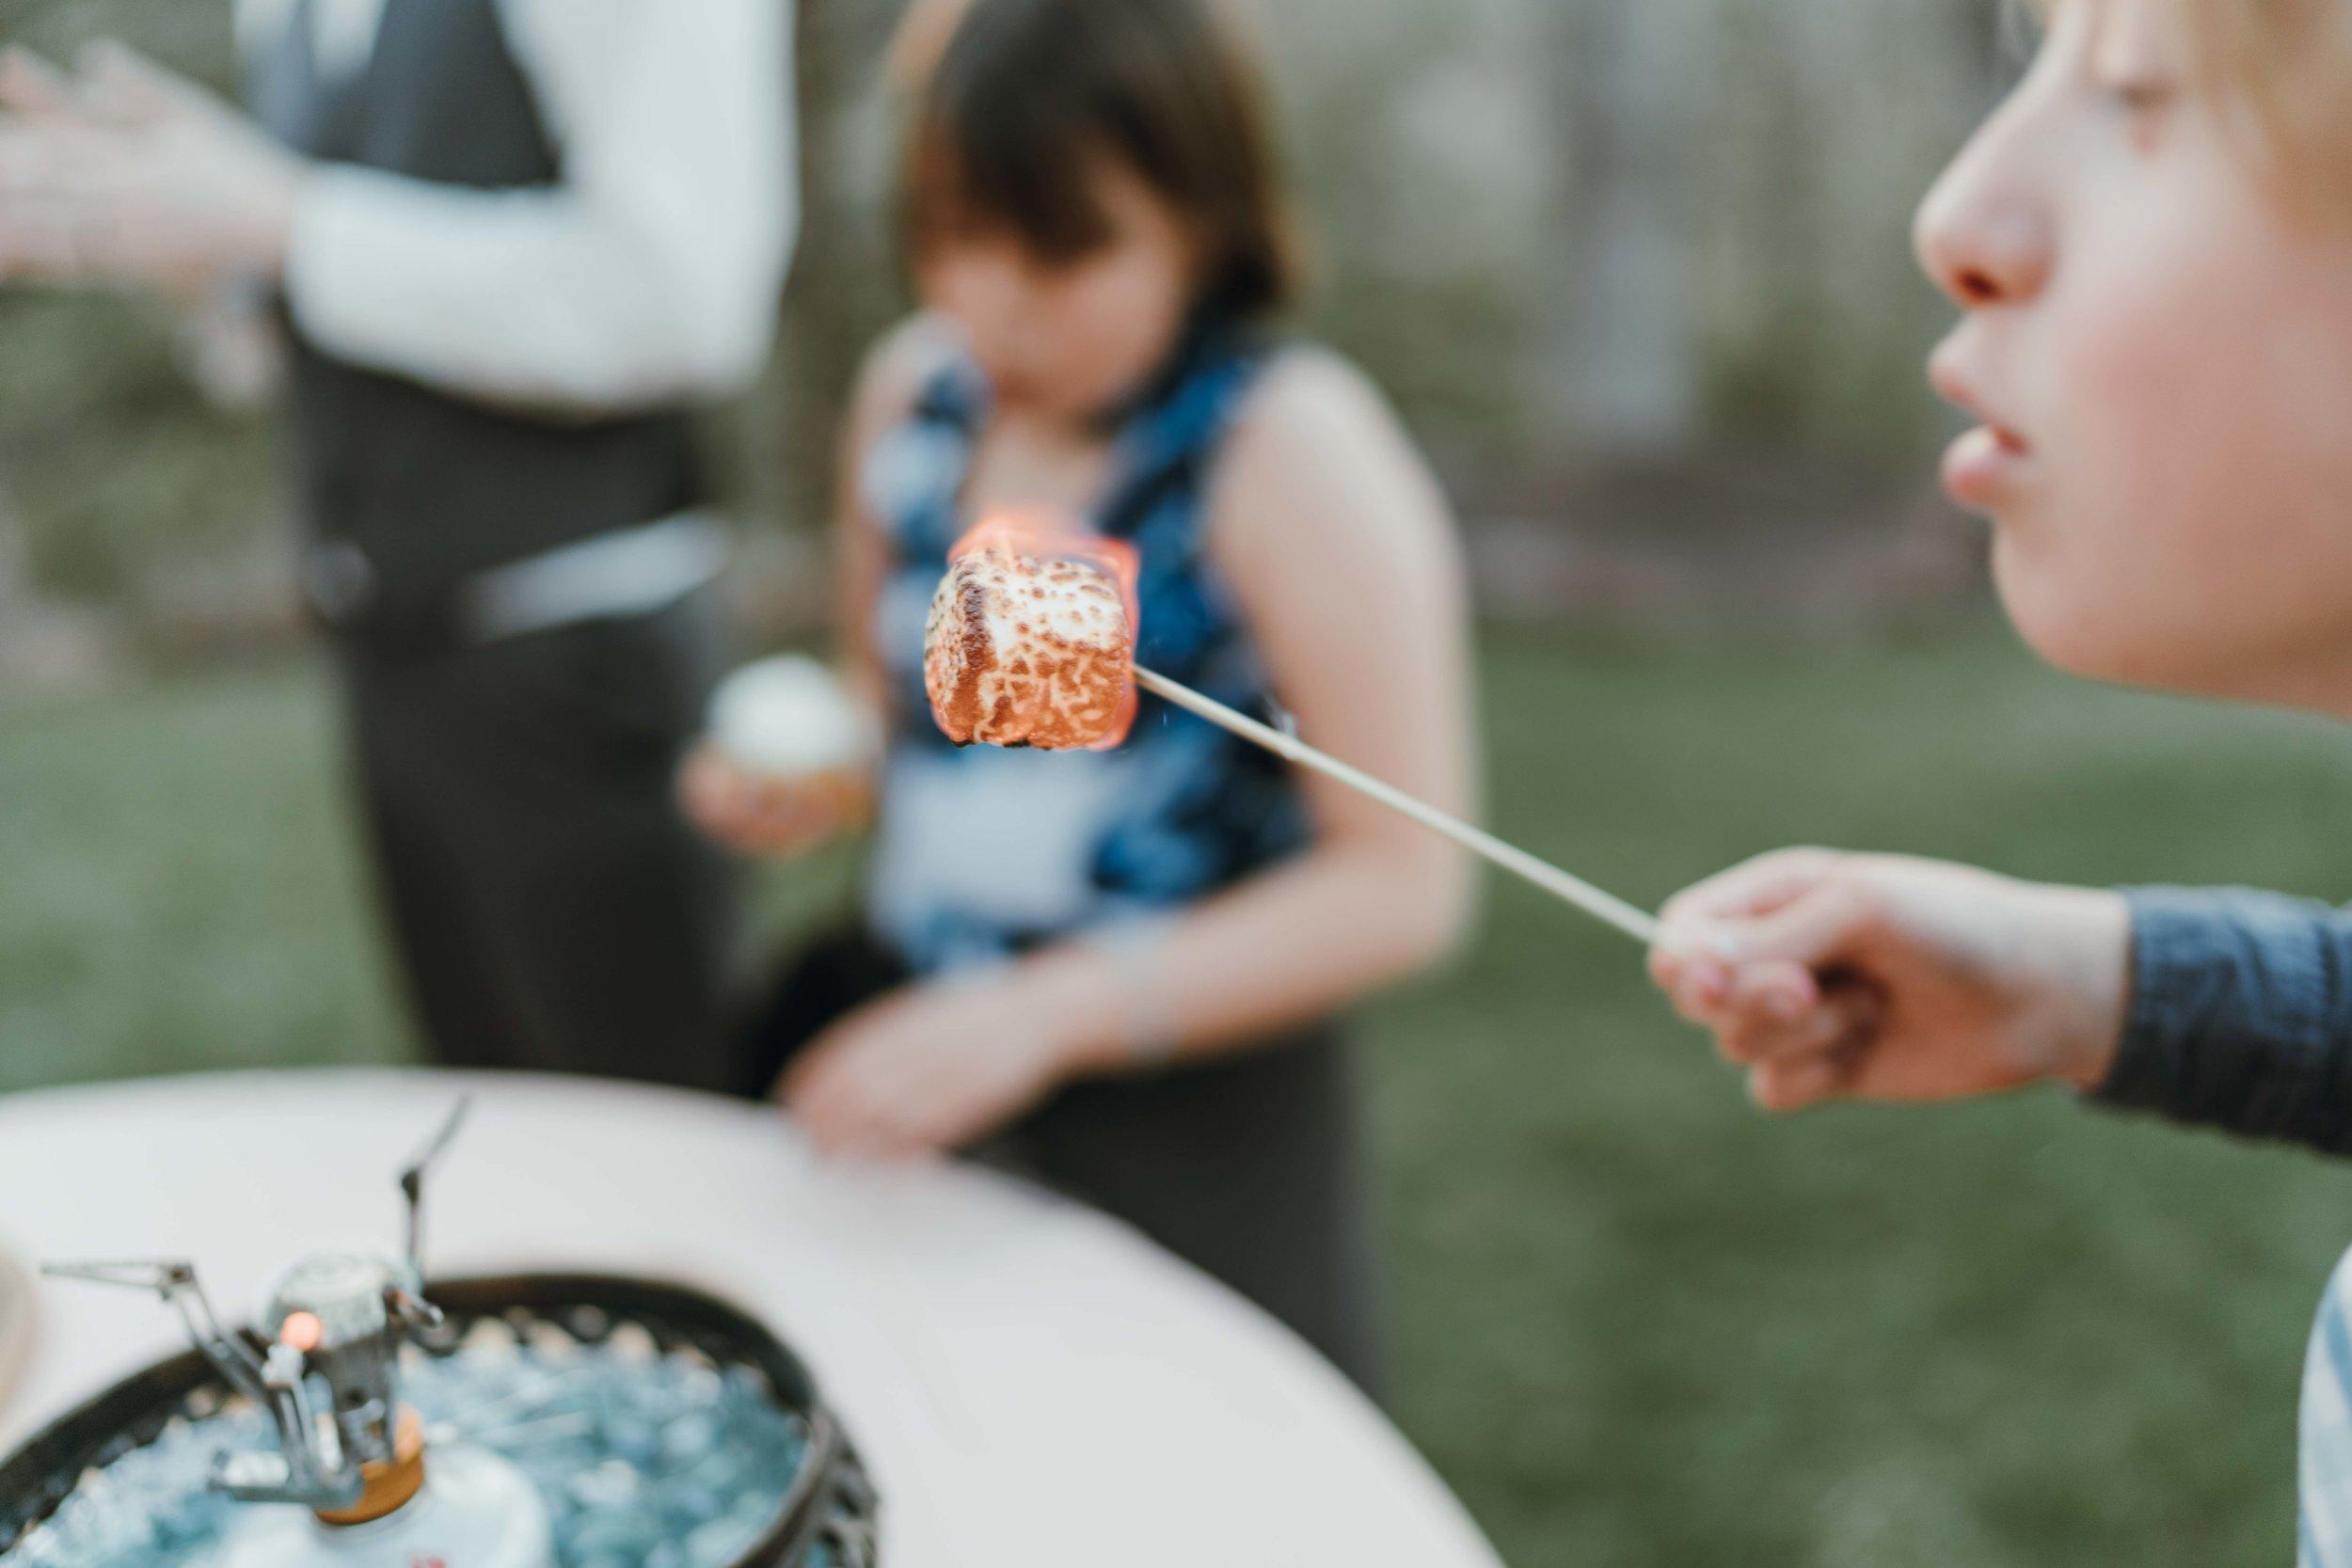 denver wedding photographer lioncrest manor in lyons ben and mali -DSC06869.jpg